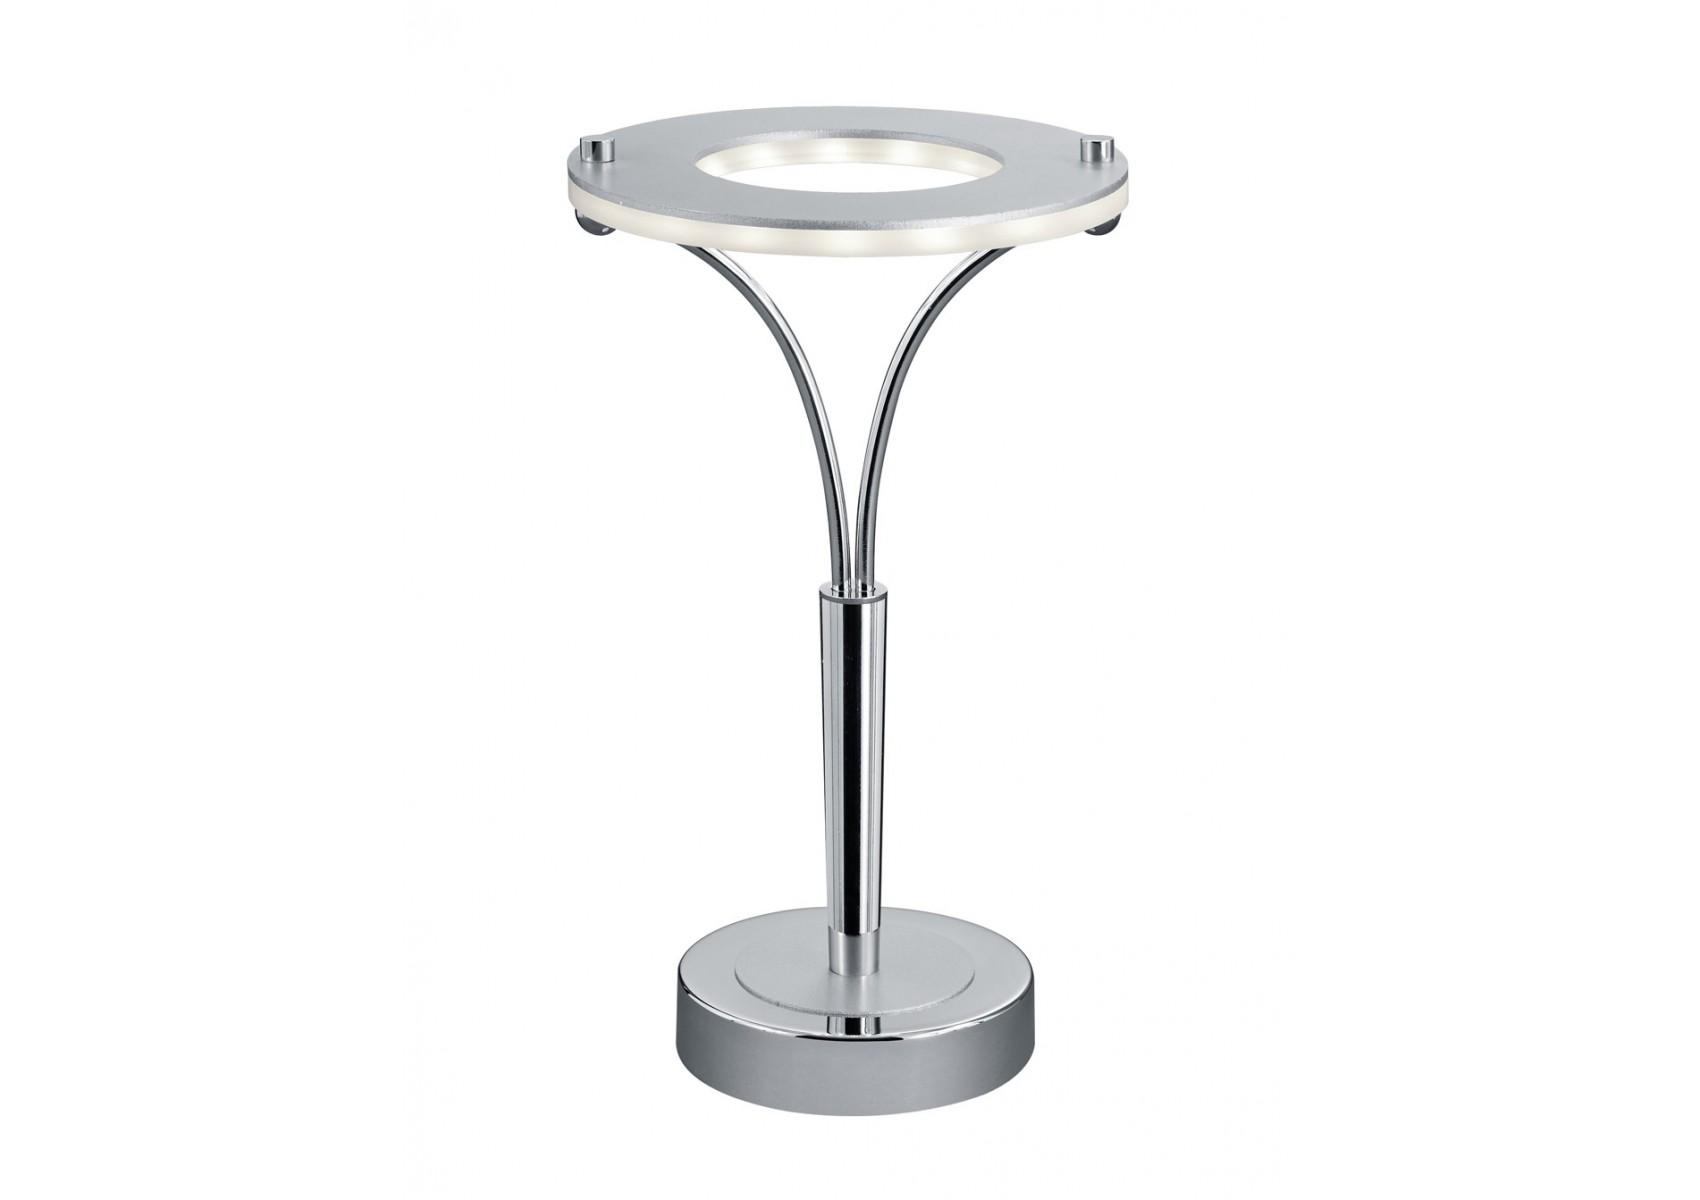 Lampe poser design toronto boite design for Lampes a poser design